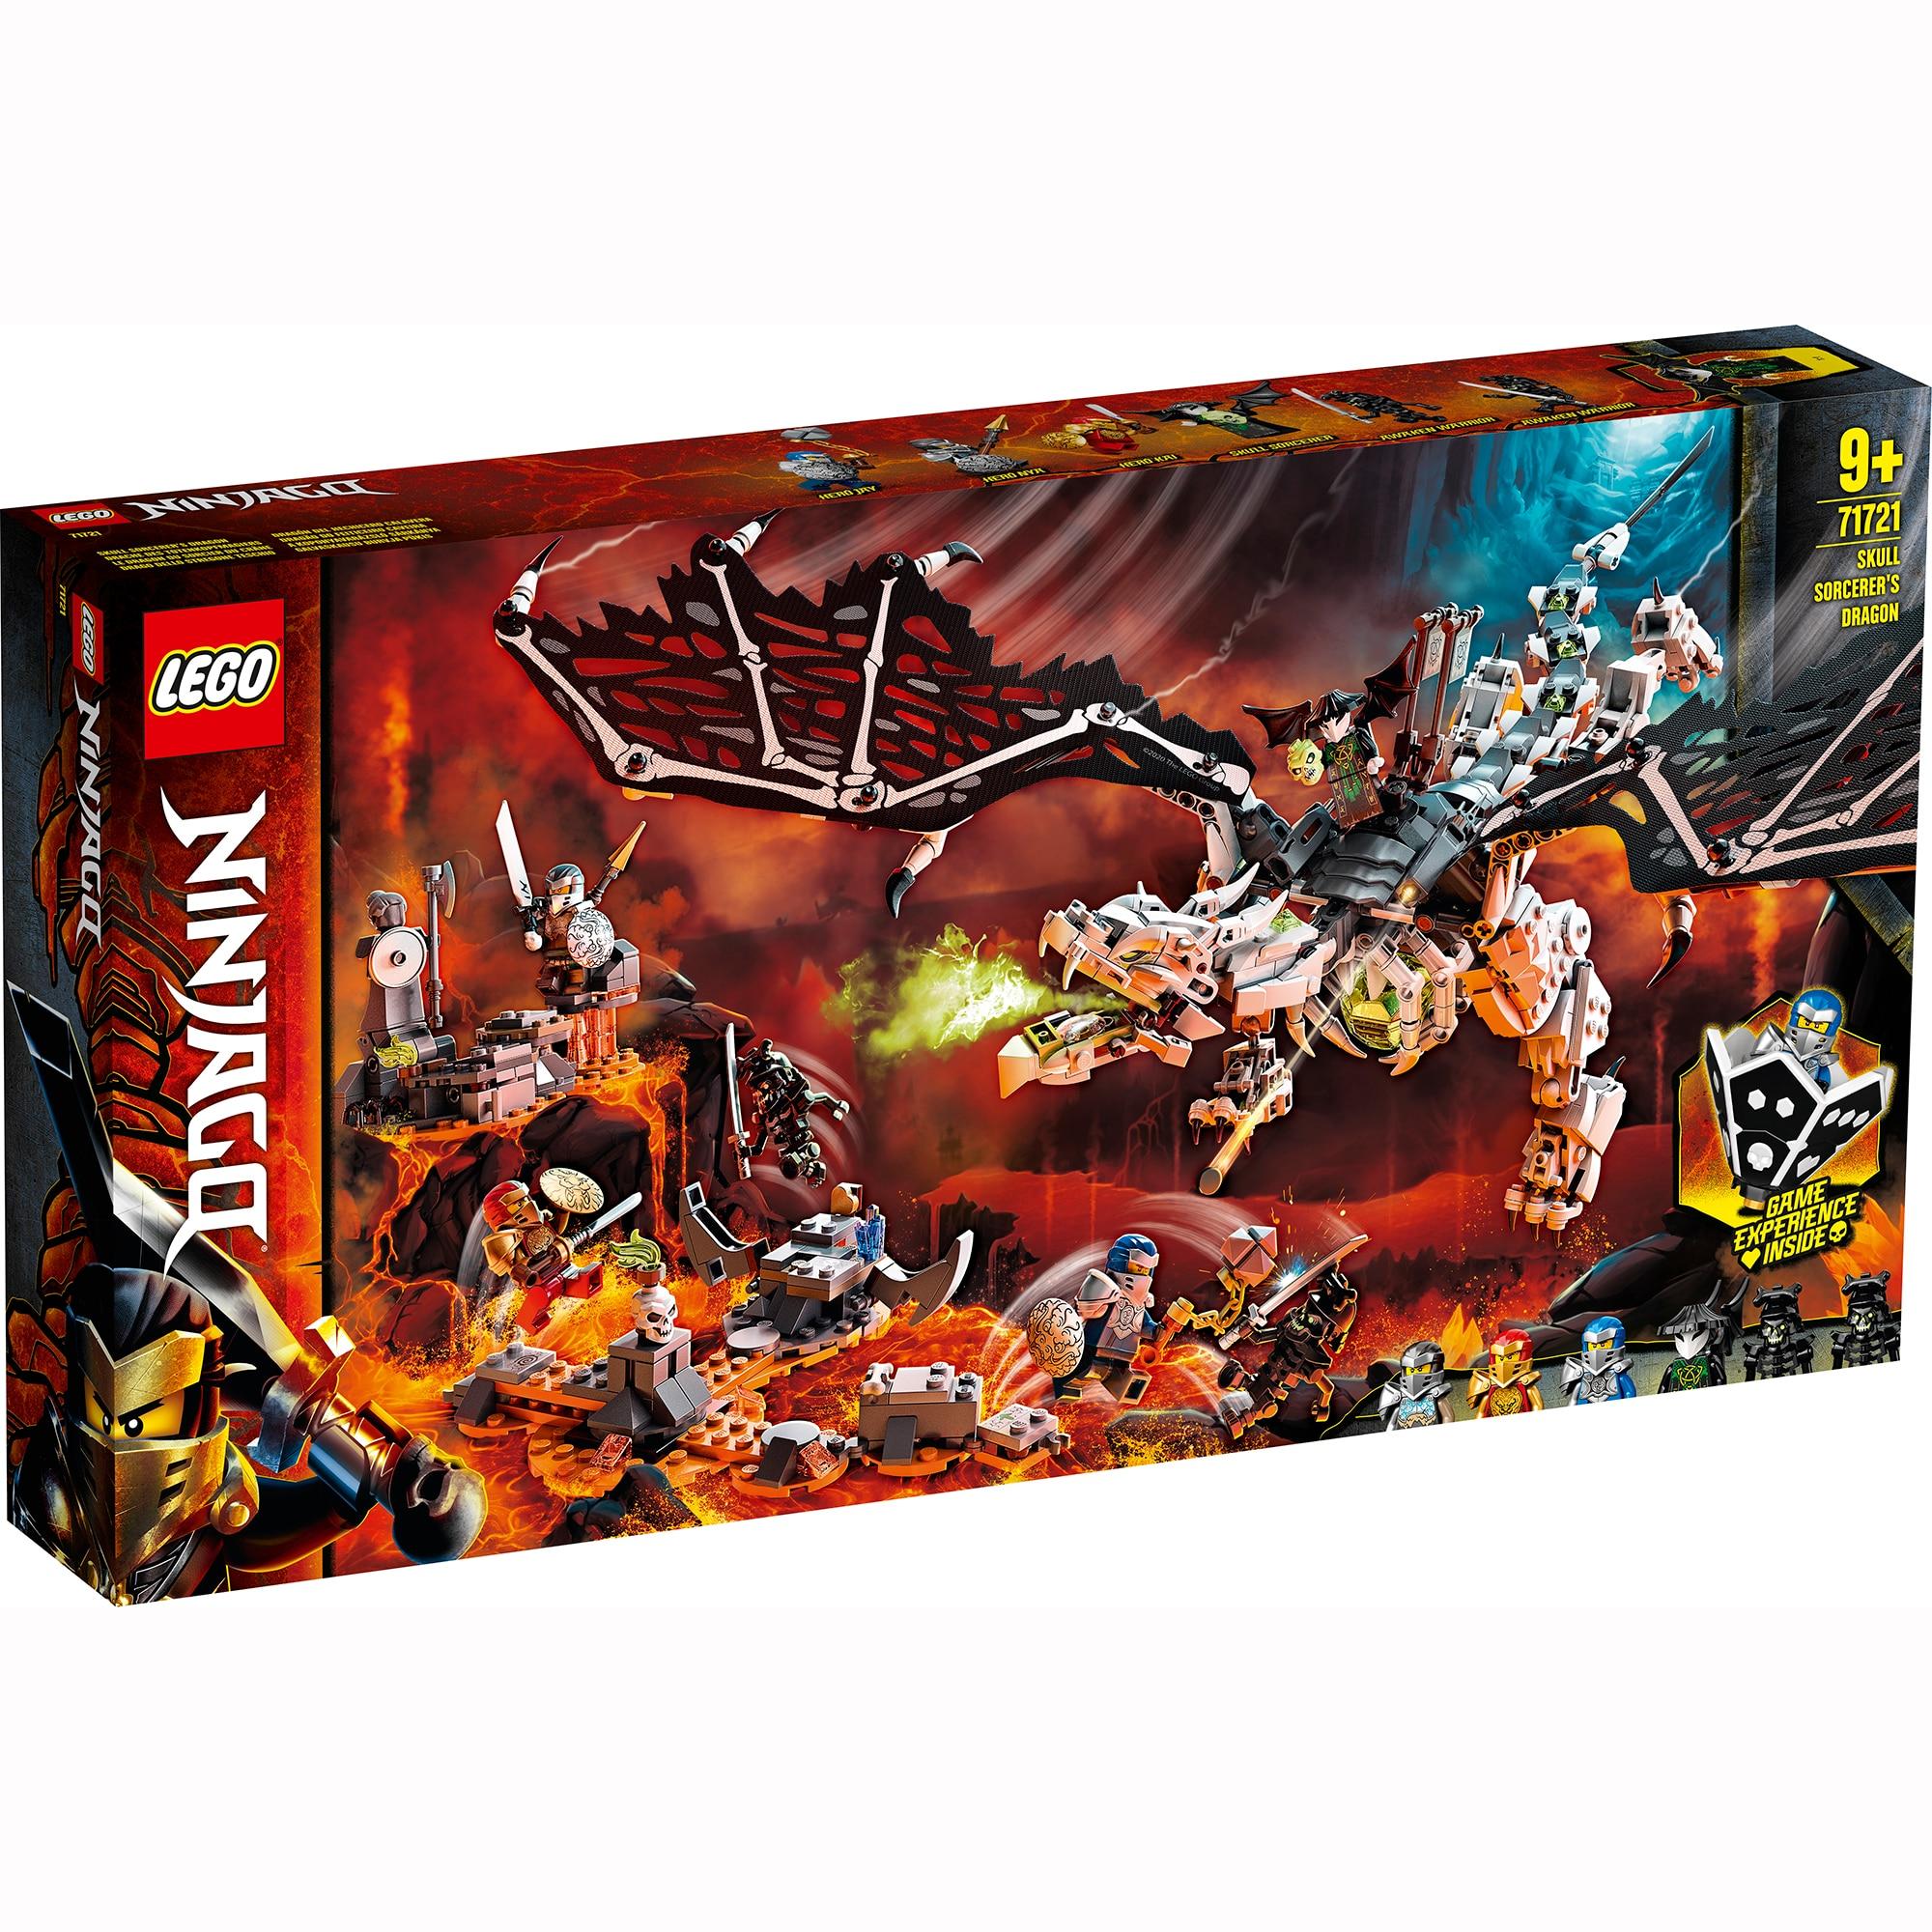 Fotografie LEGO NINJAGO - Dragonul vrajitorului Craniu 71721